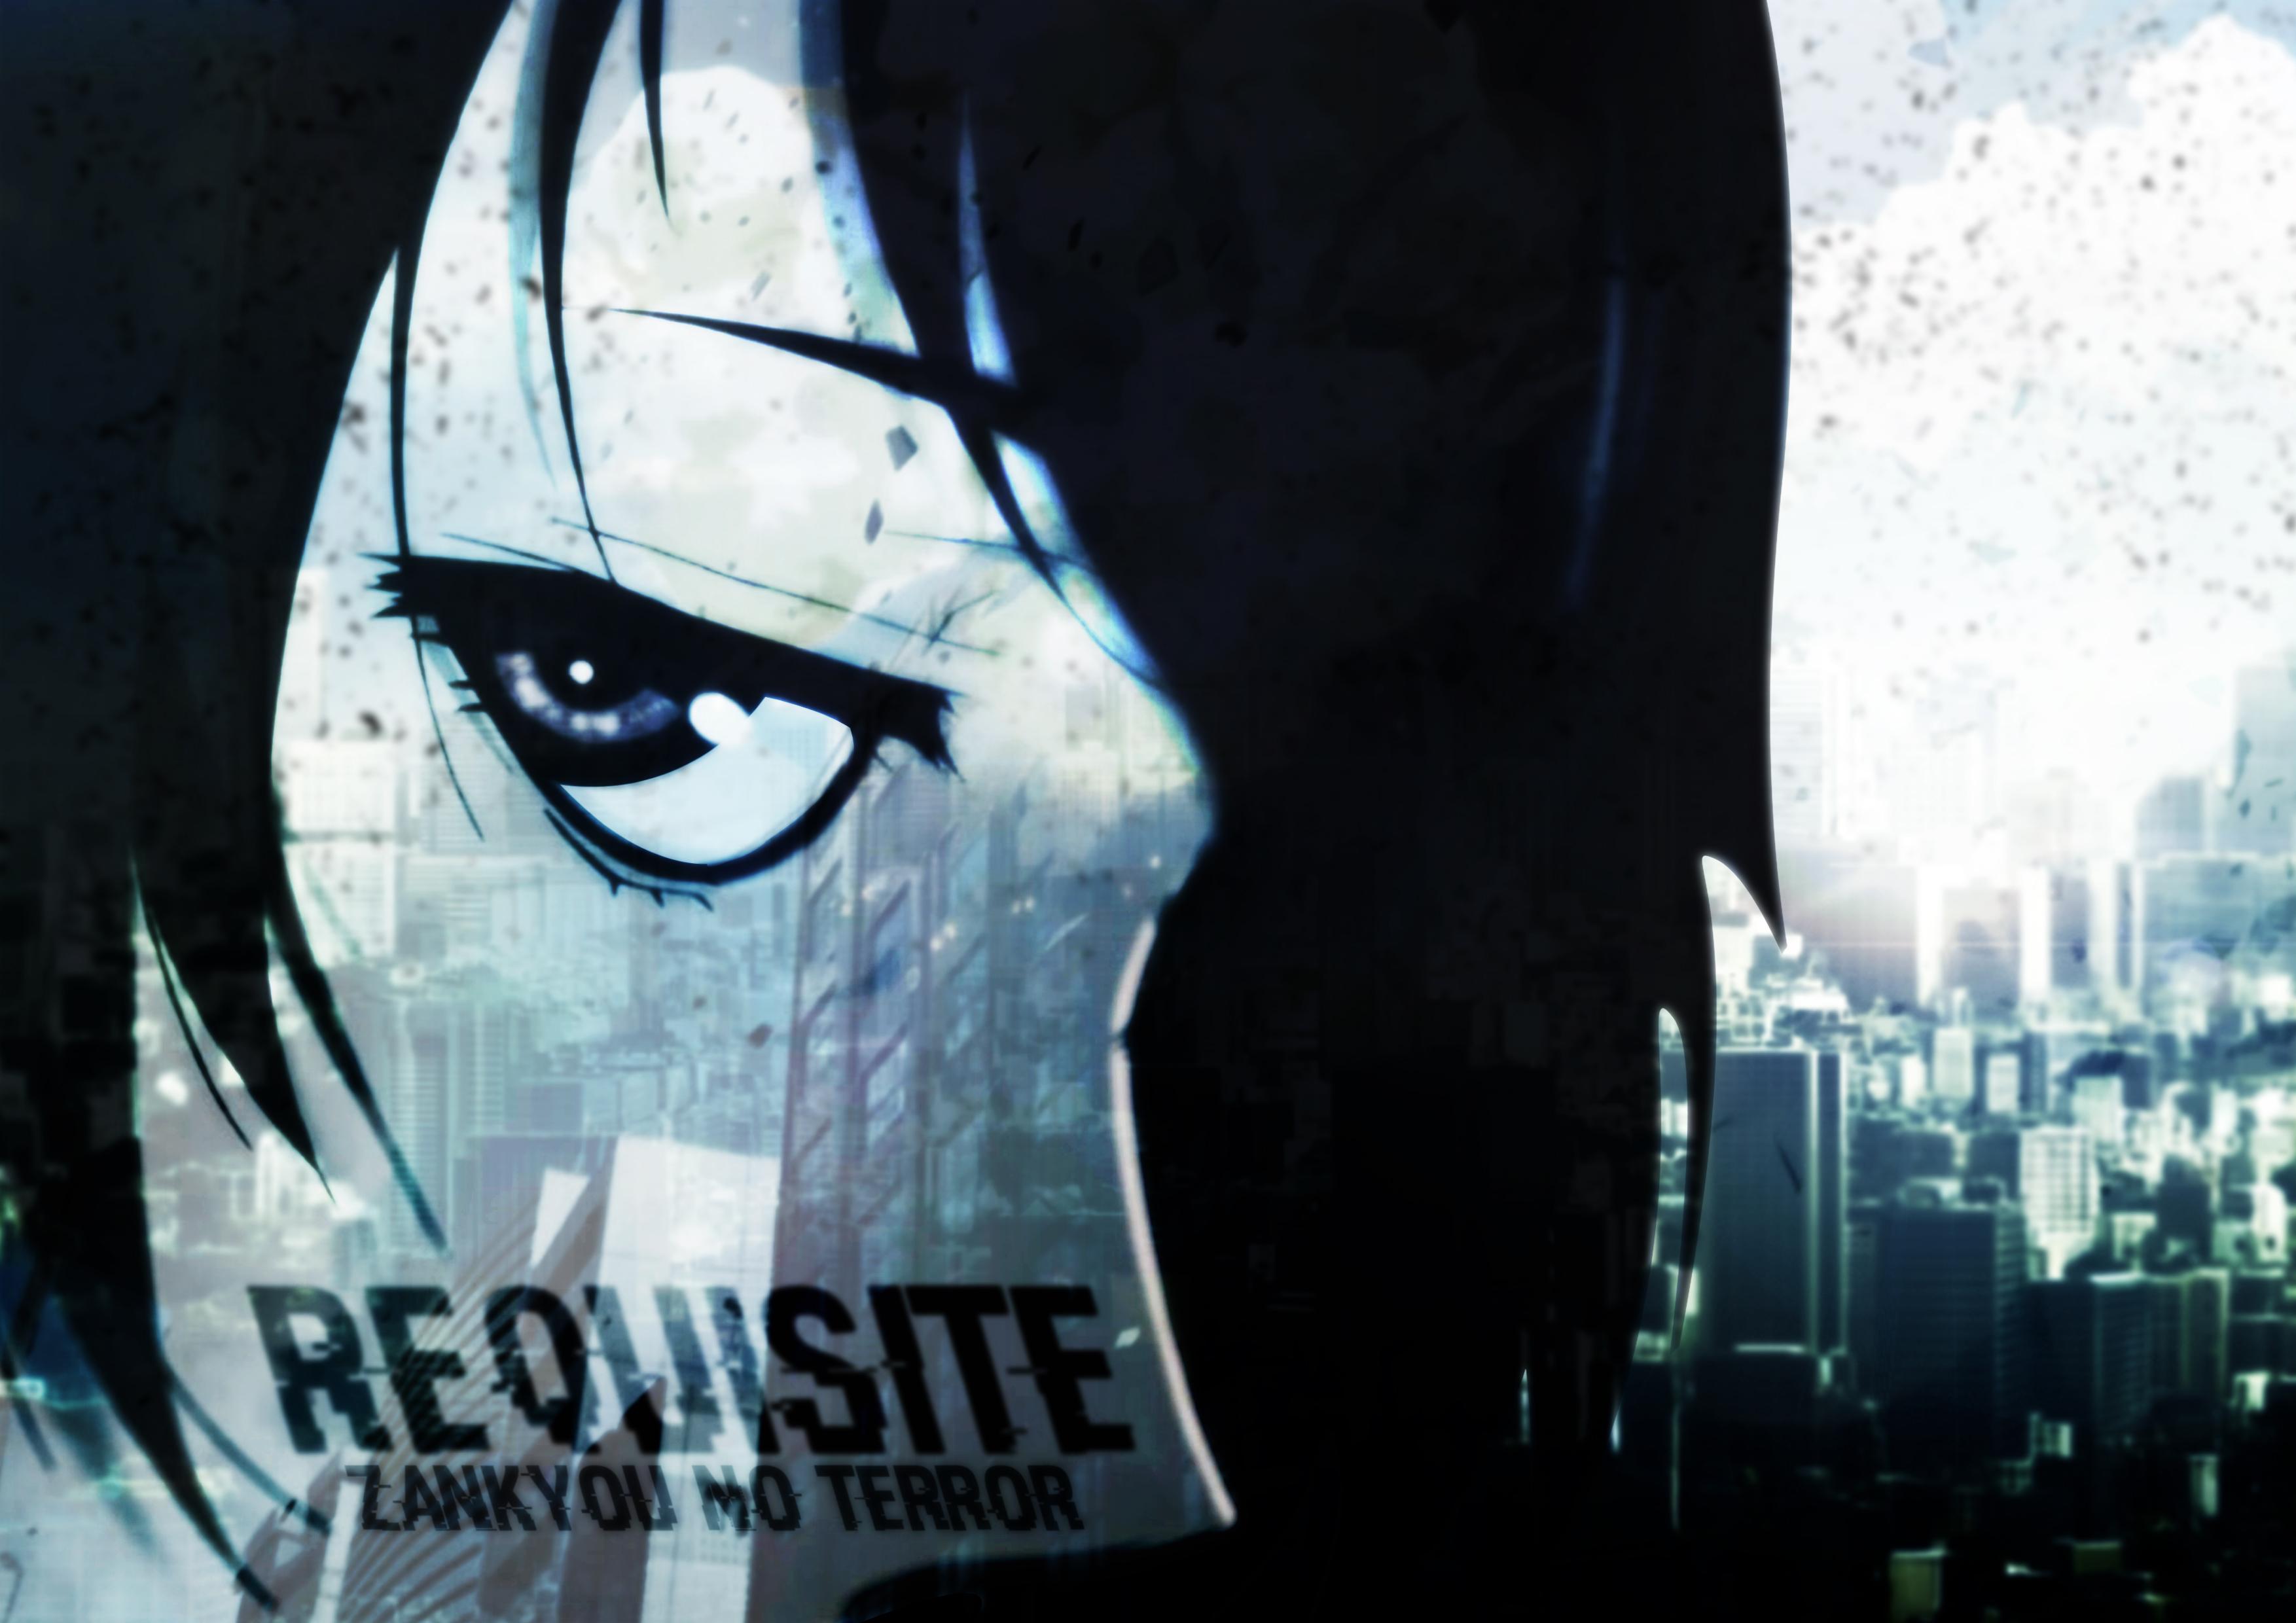 Requisite [Zankyou No Terror] by HatsOff-Designs on DeviantArt